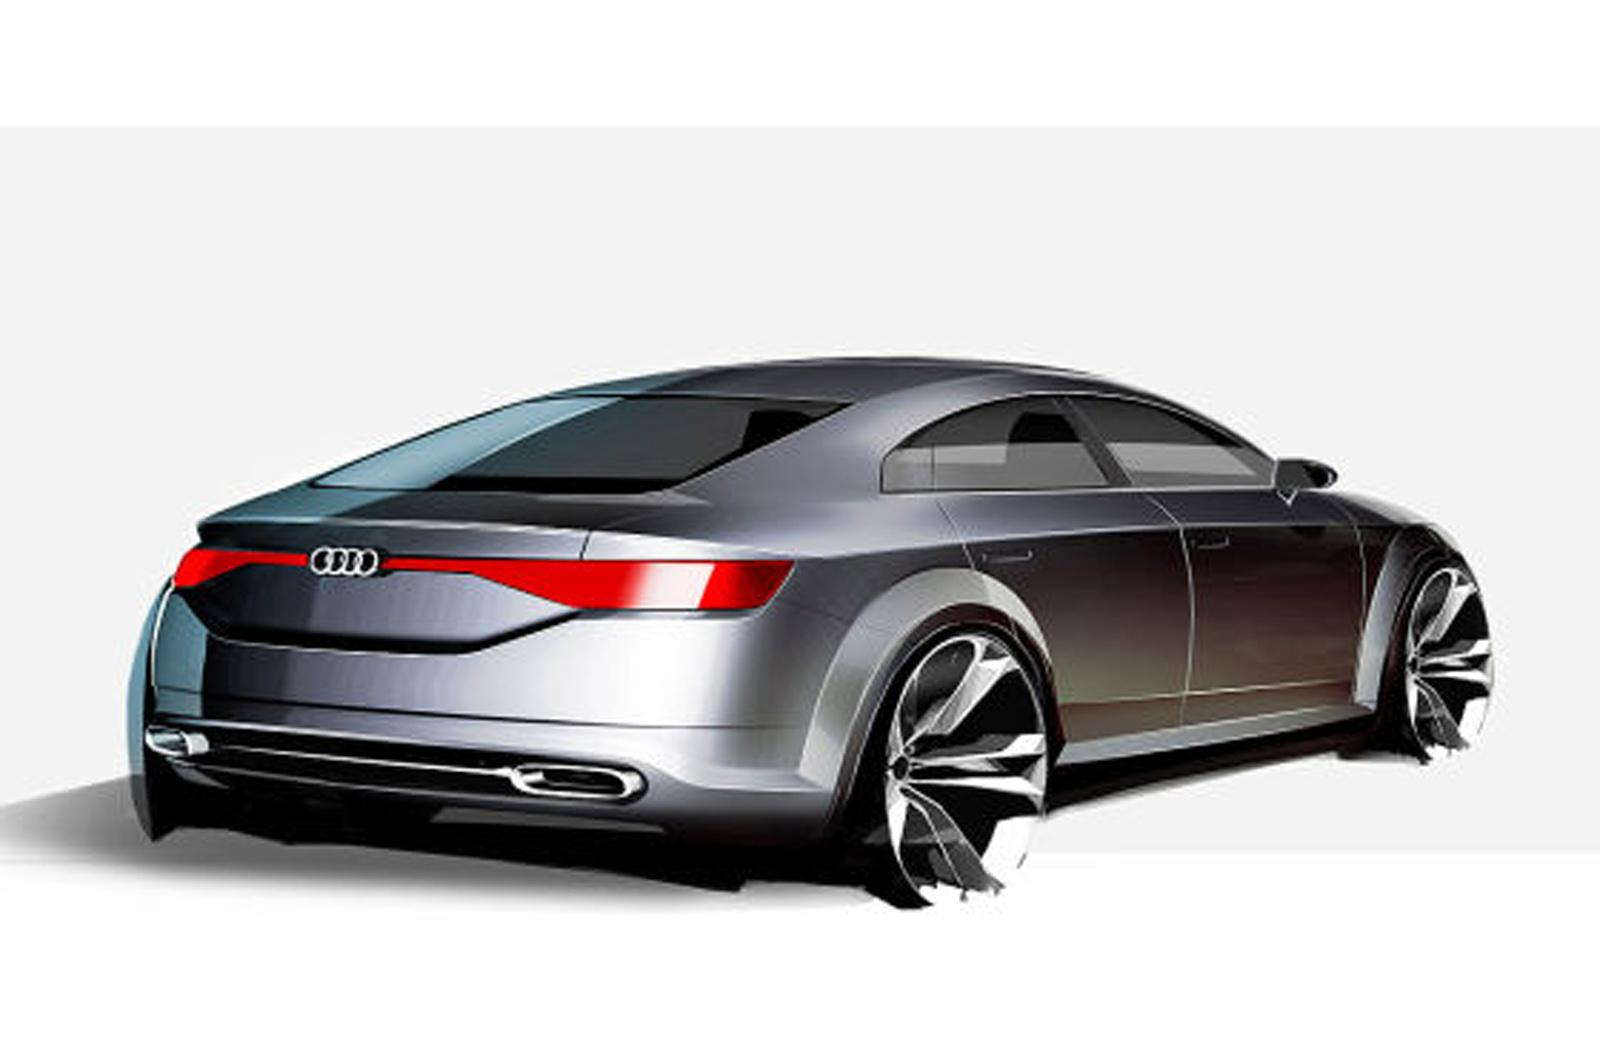 audi tt sportback concept sketch emerges ahead of alleged paris debut updated autoevolution. Black Bedroom Furniture Sets. Home Design Ideas